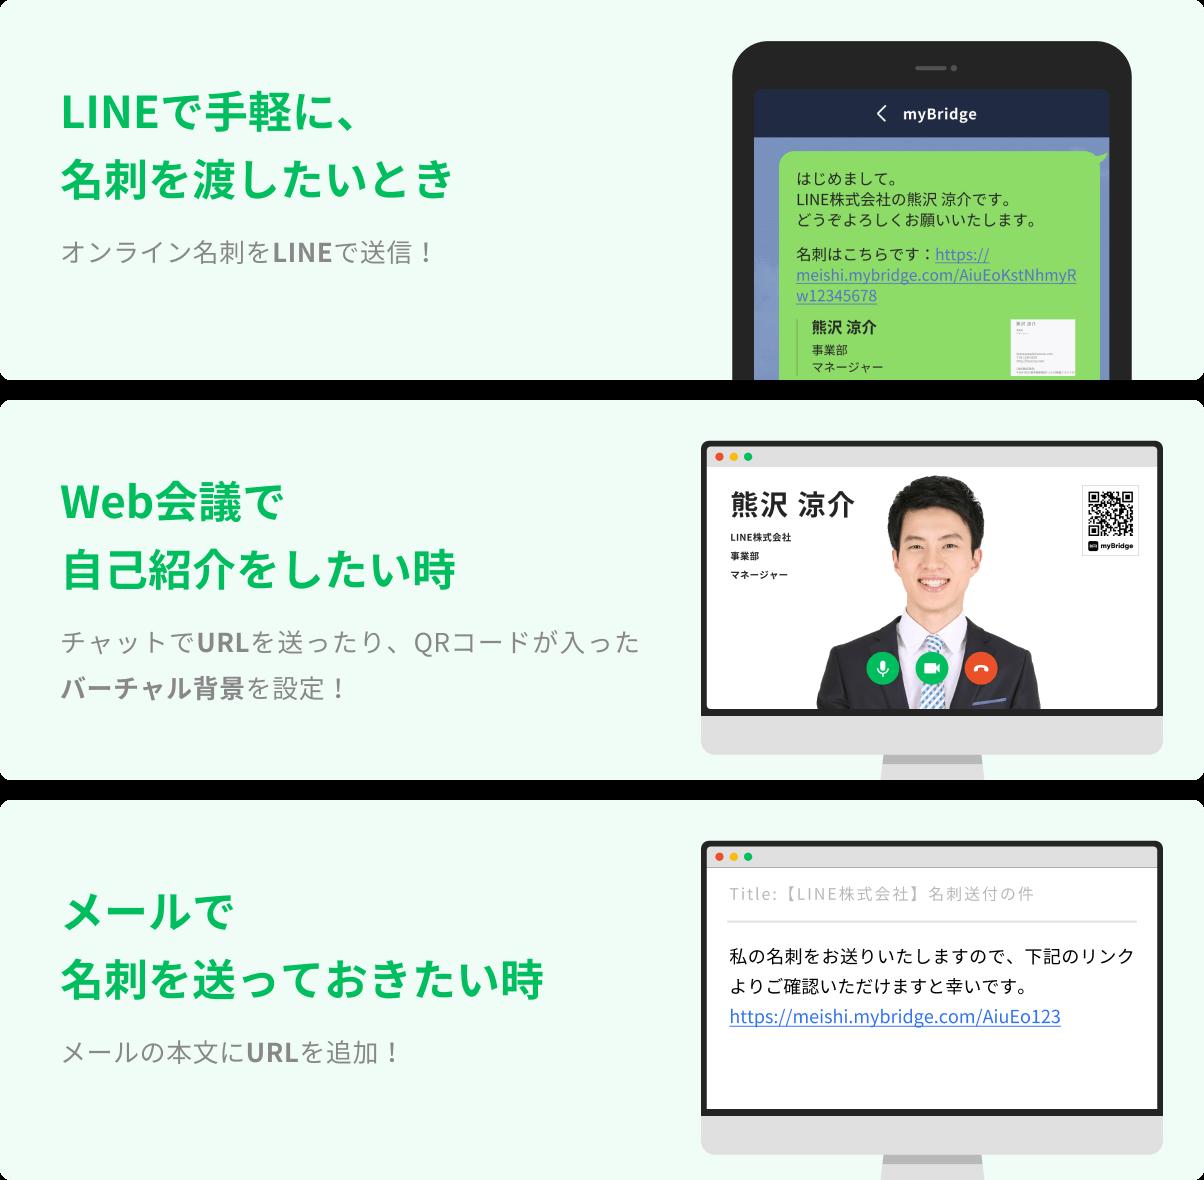 /stf/linecorp/ja/pr/bottom_onlinemeishi.png